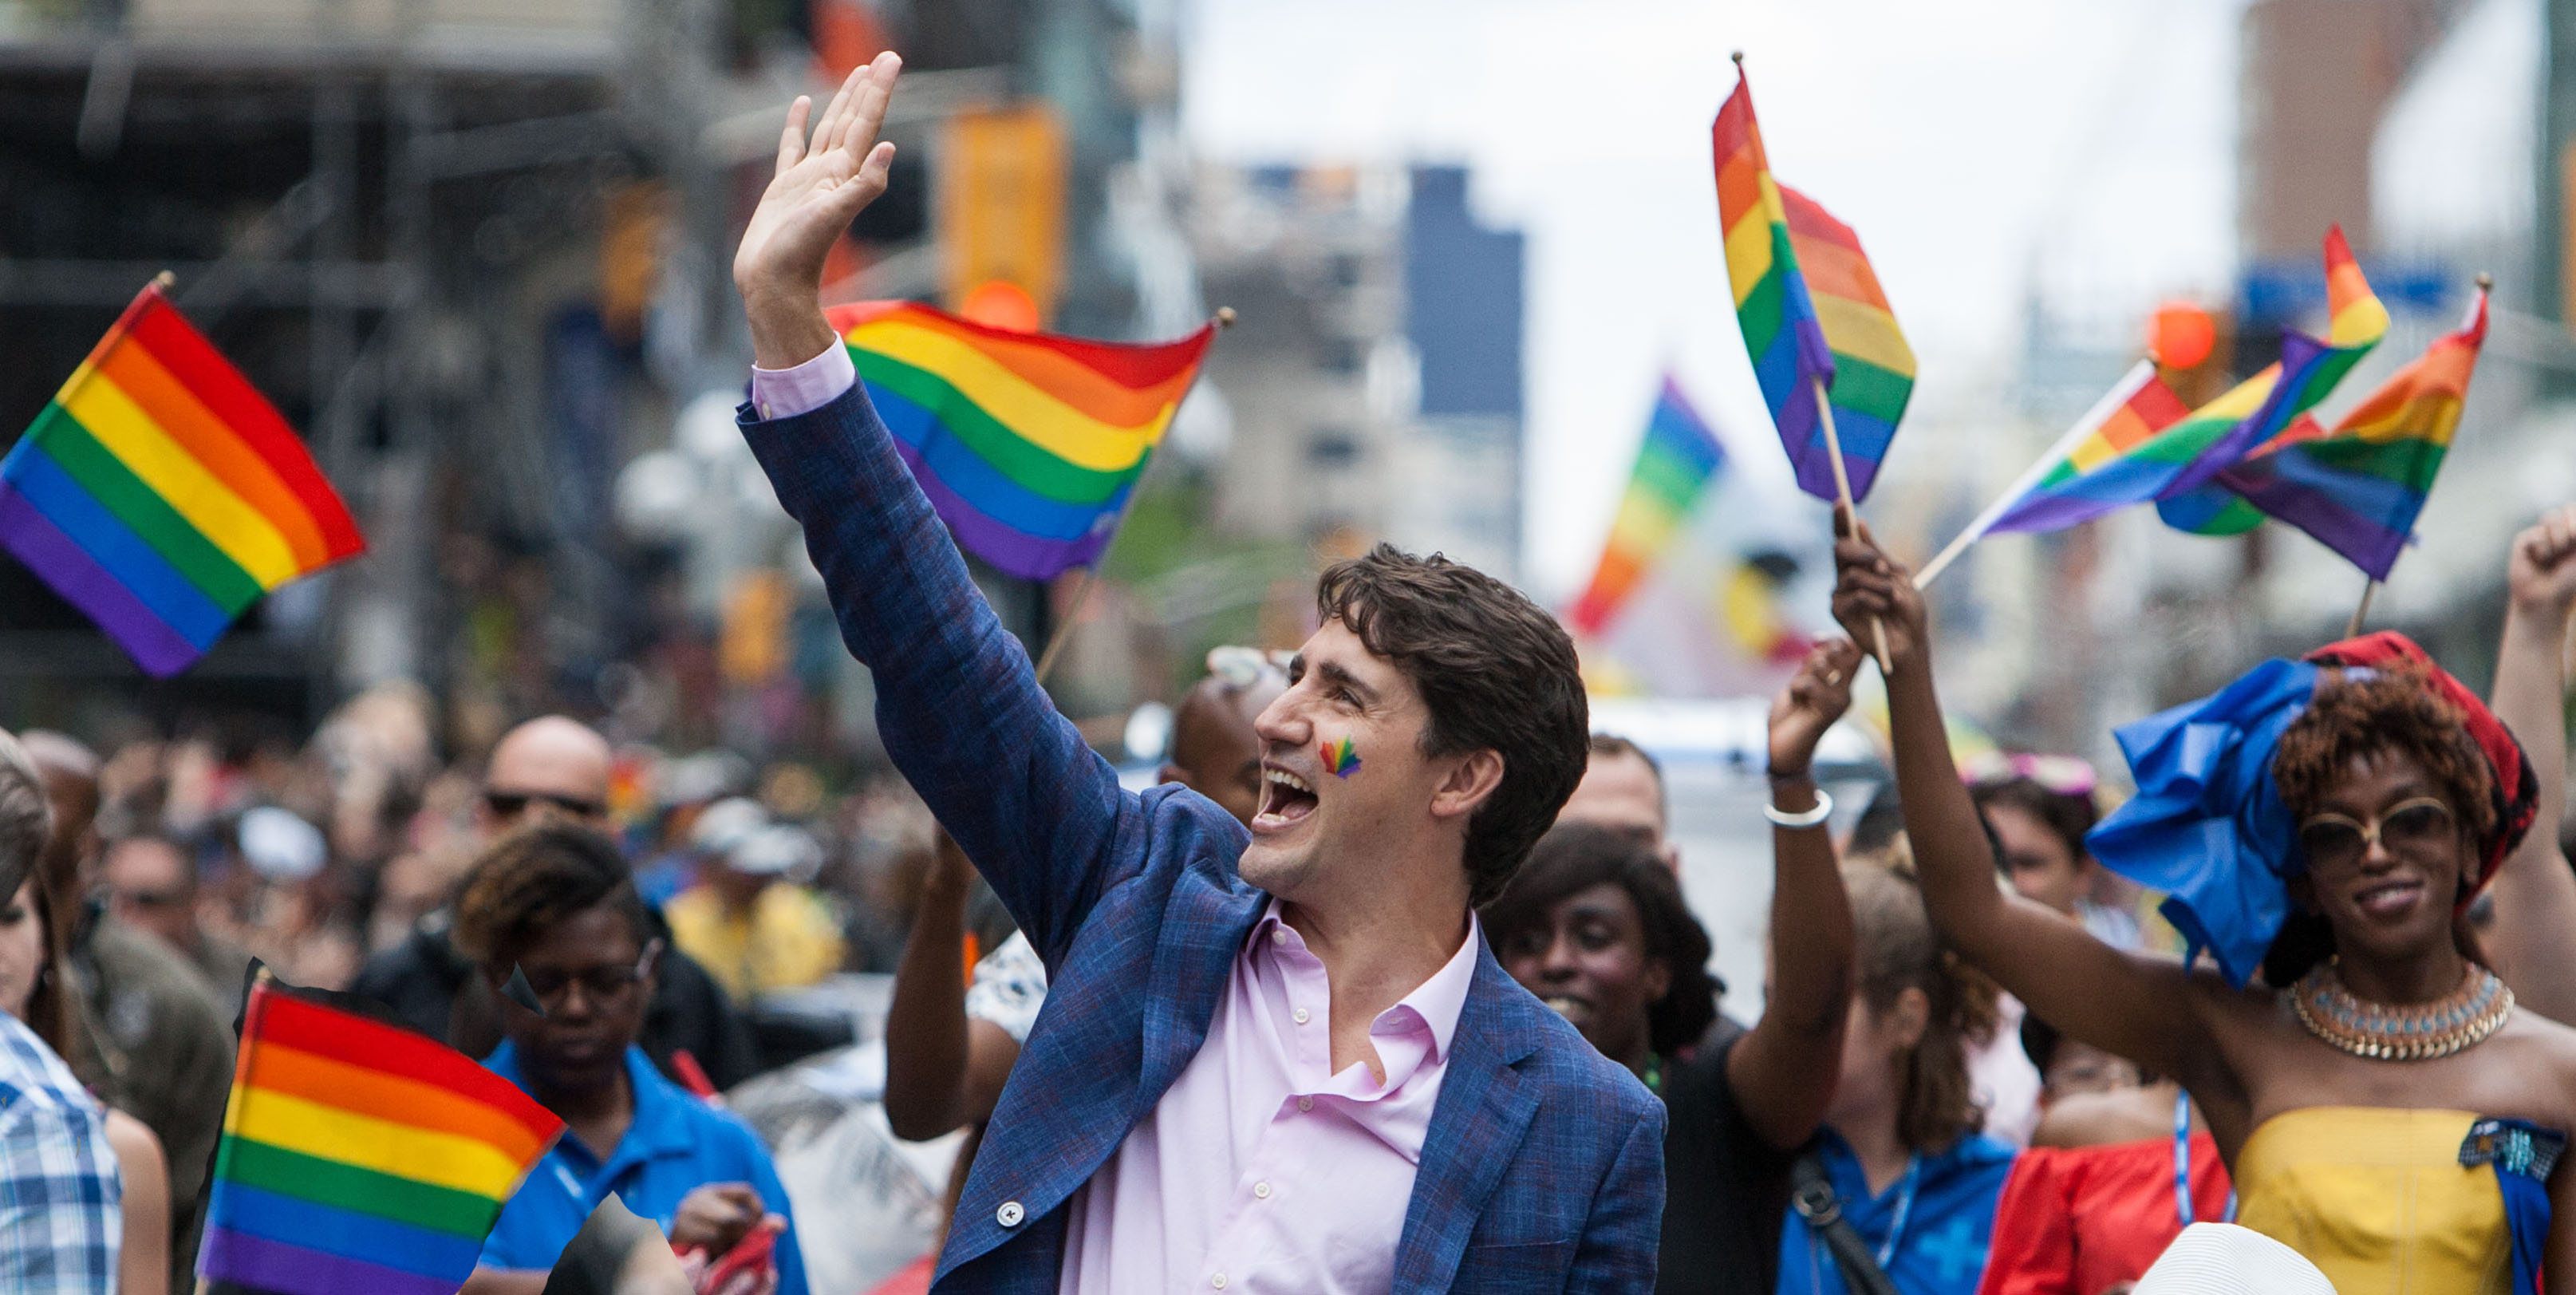 premier Justin Trudeau